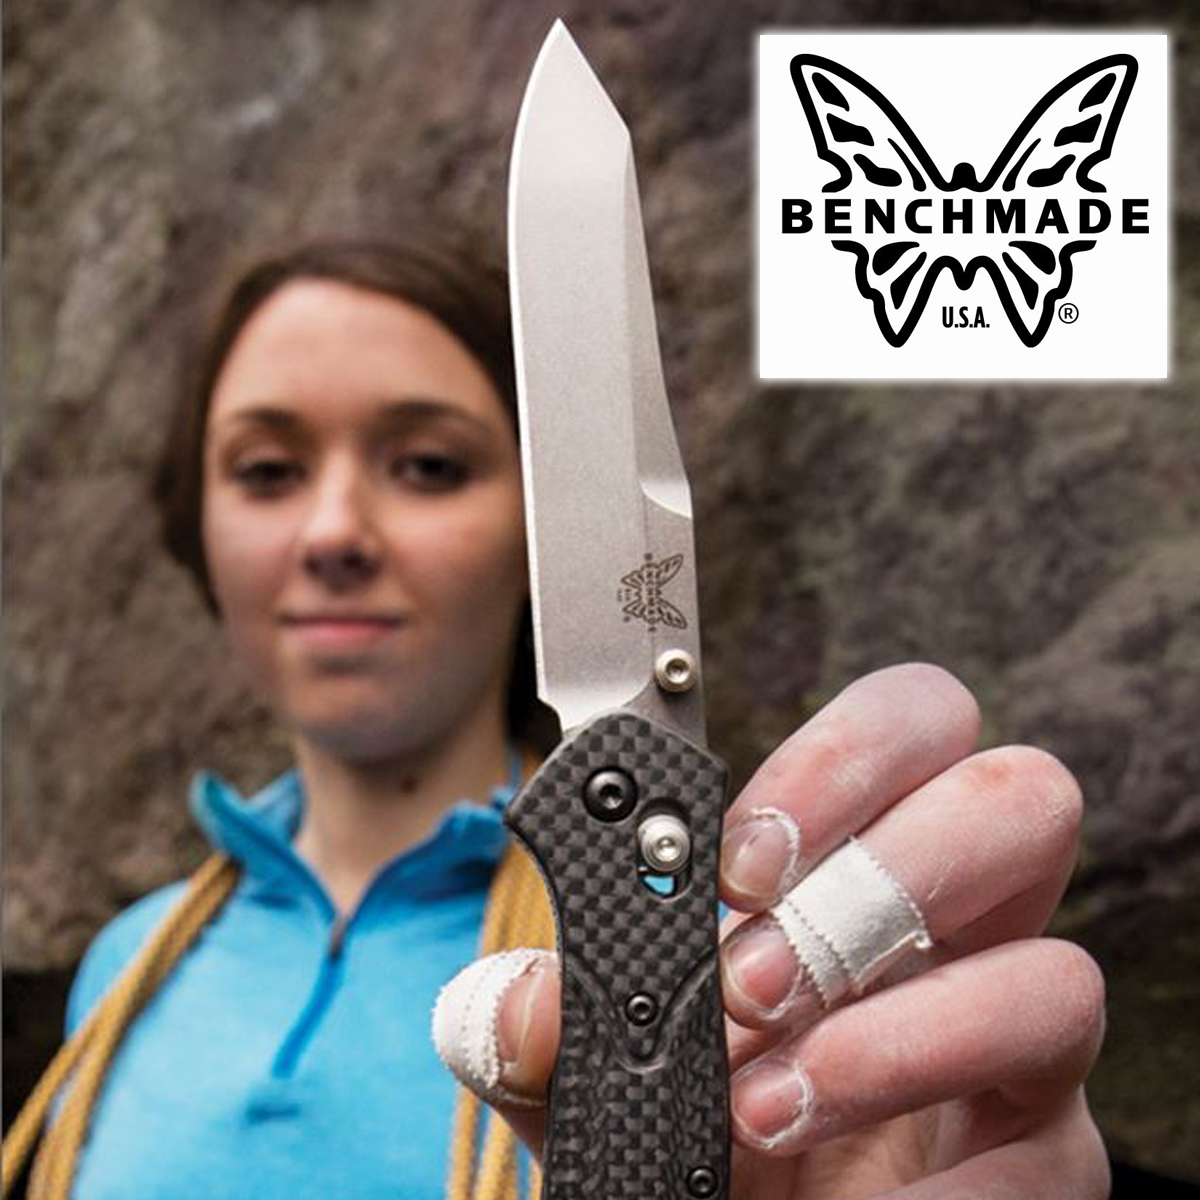 Benchmade Knives Nashville, TN Lifeview